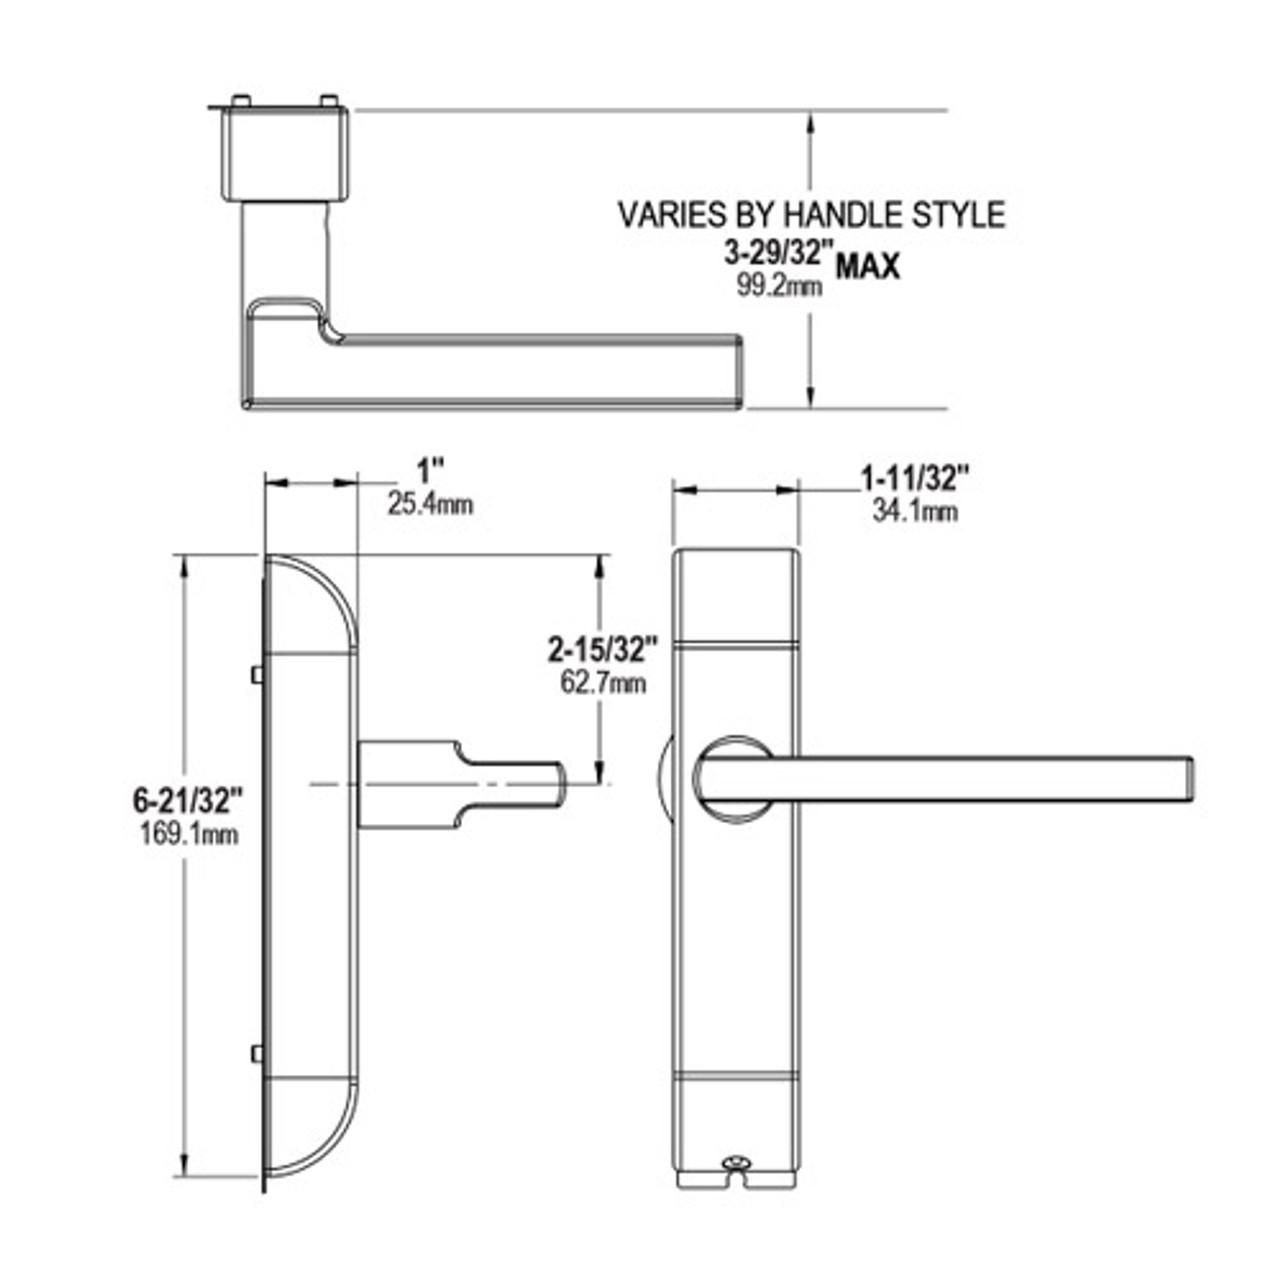 4600-MW-532-US10B Adams Rite MW Designer handle Dimensional View